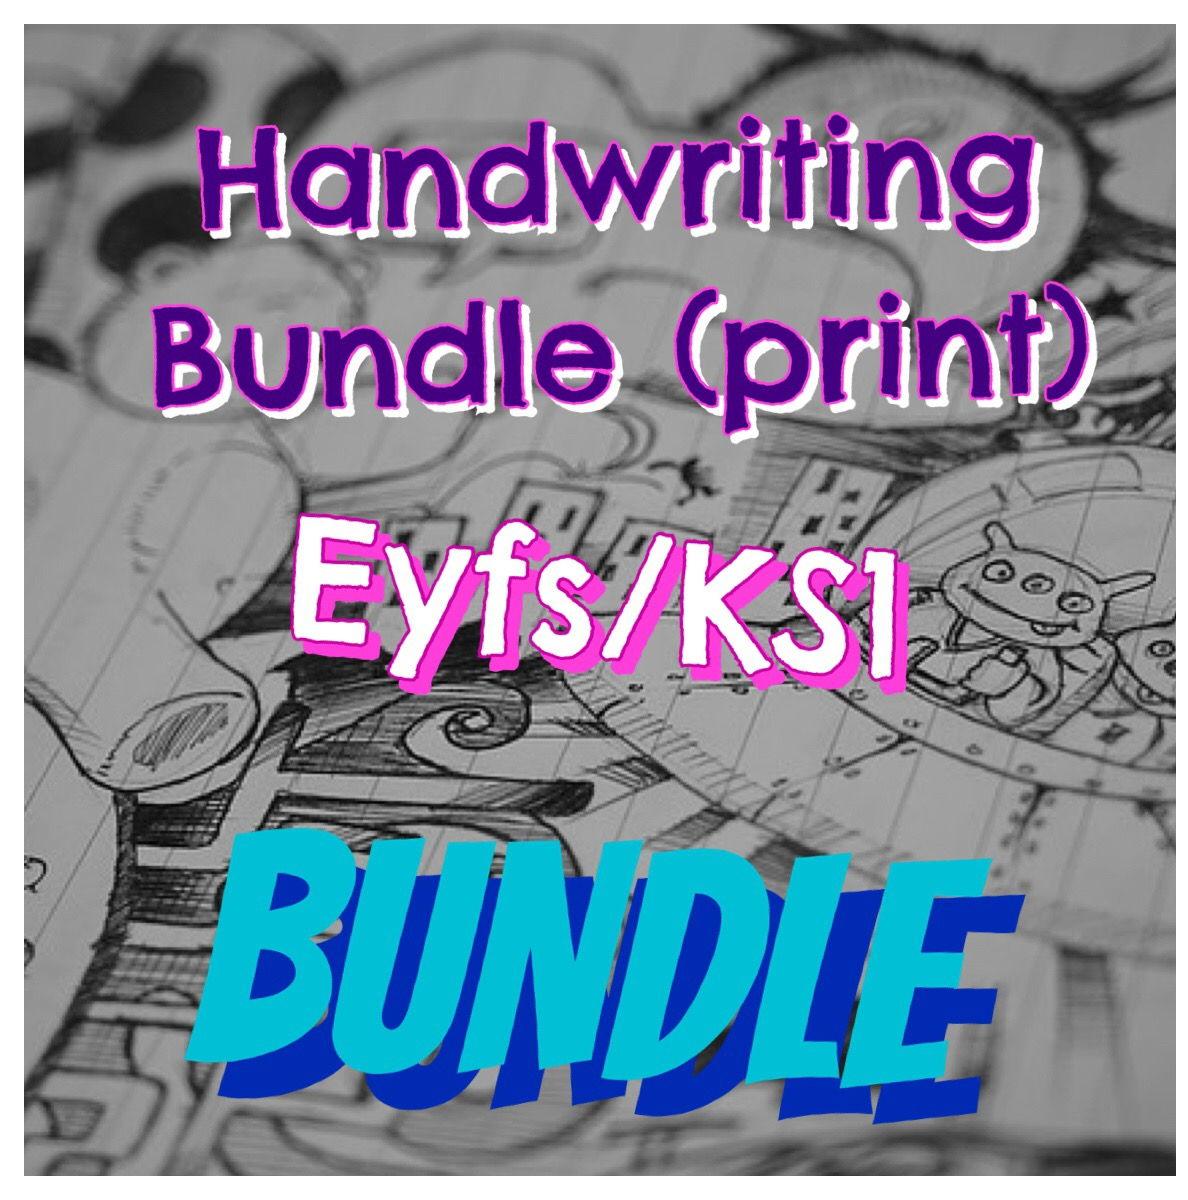 Handwriting Bundle (Printed Font)